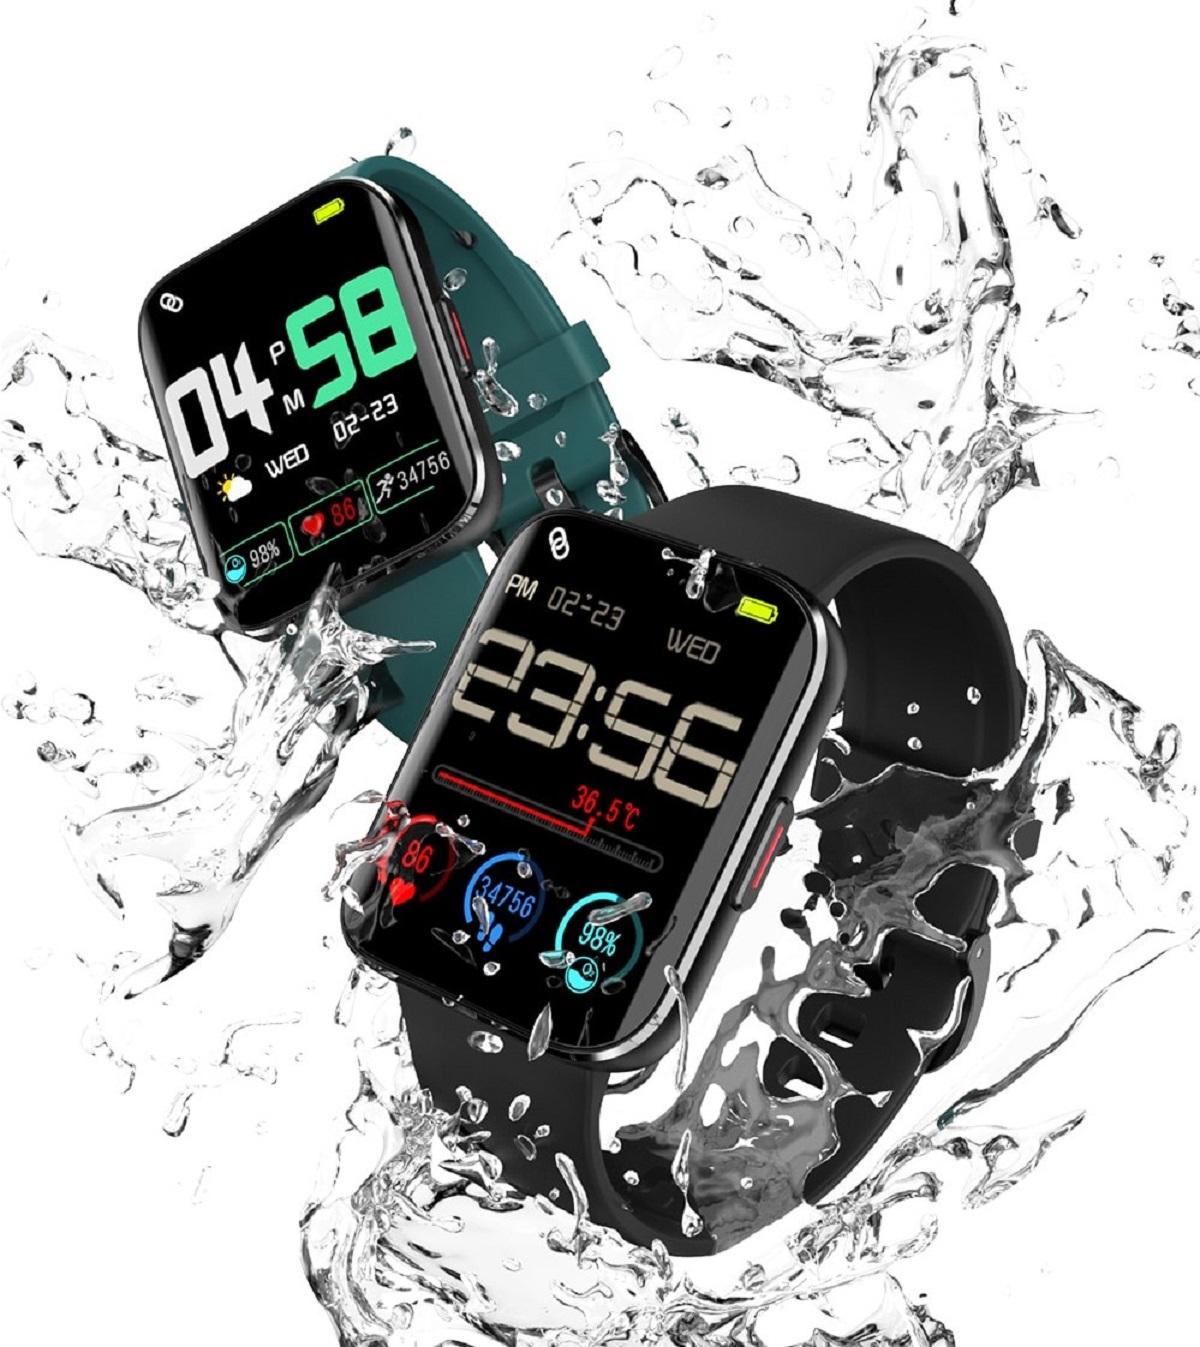 Nová značka KUMI rozdává chytré hodinky [sponzorovaný článek]